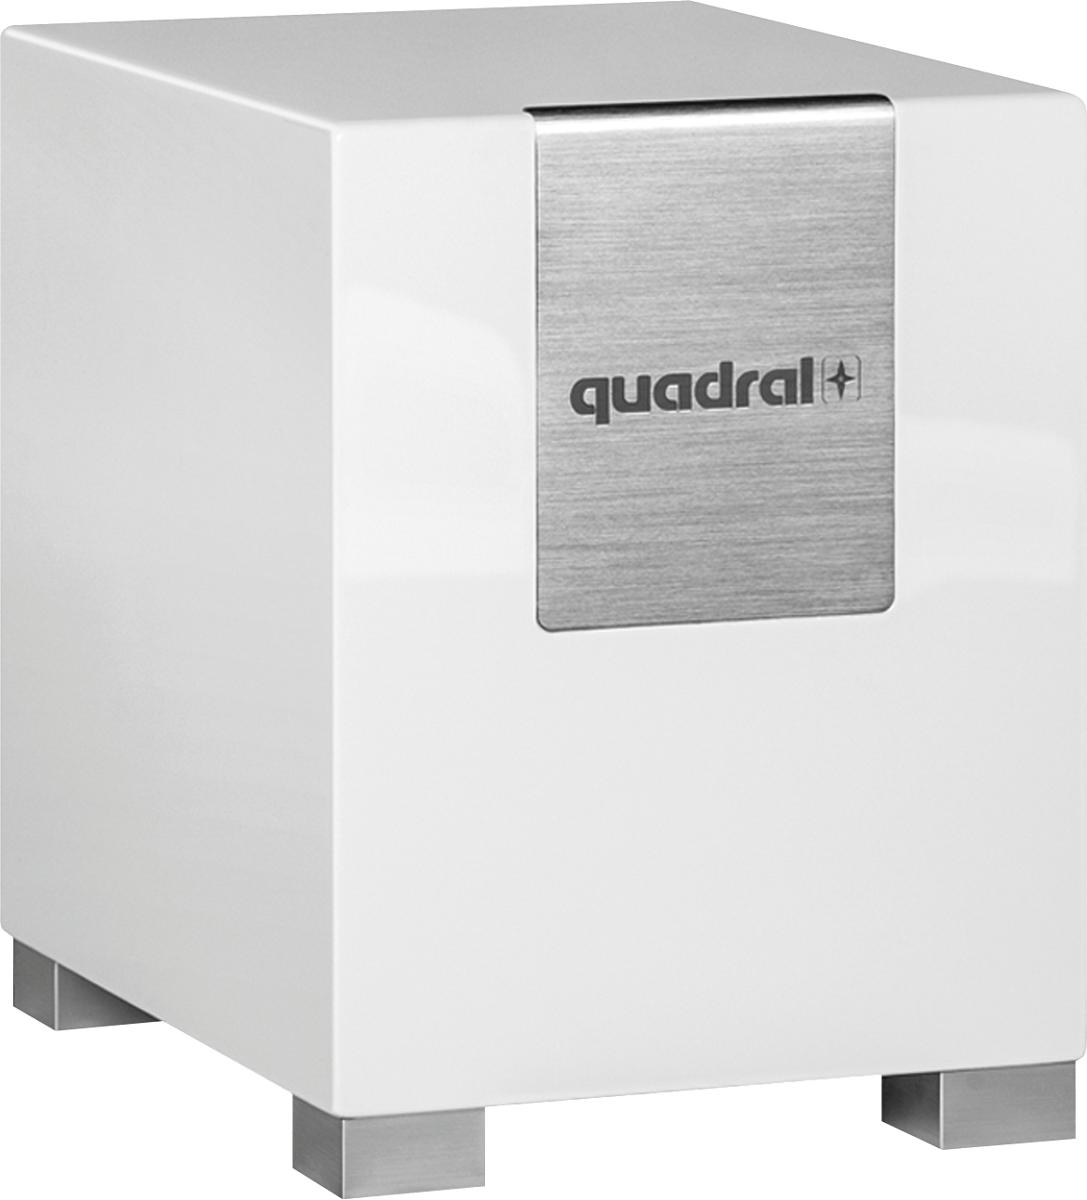 quadral qube 8 silk caisson de basse plus actif 30 200. Black Bedroom Furniture Sets. Home Design Ideas